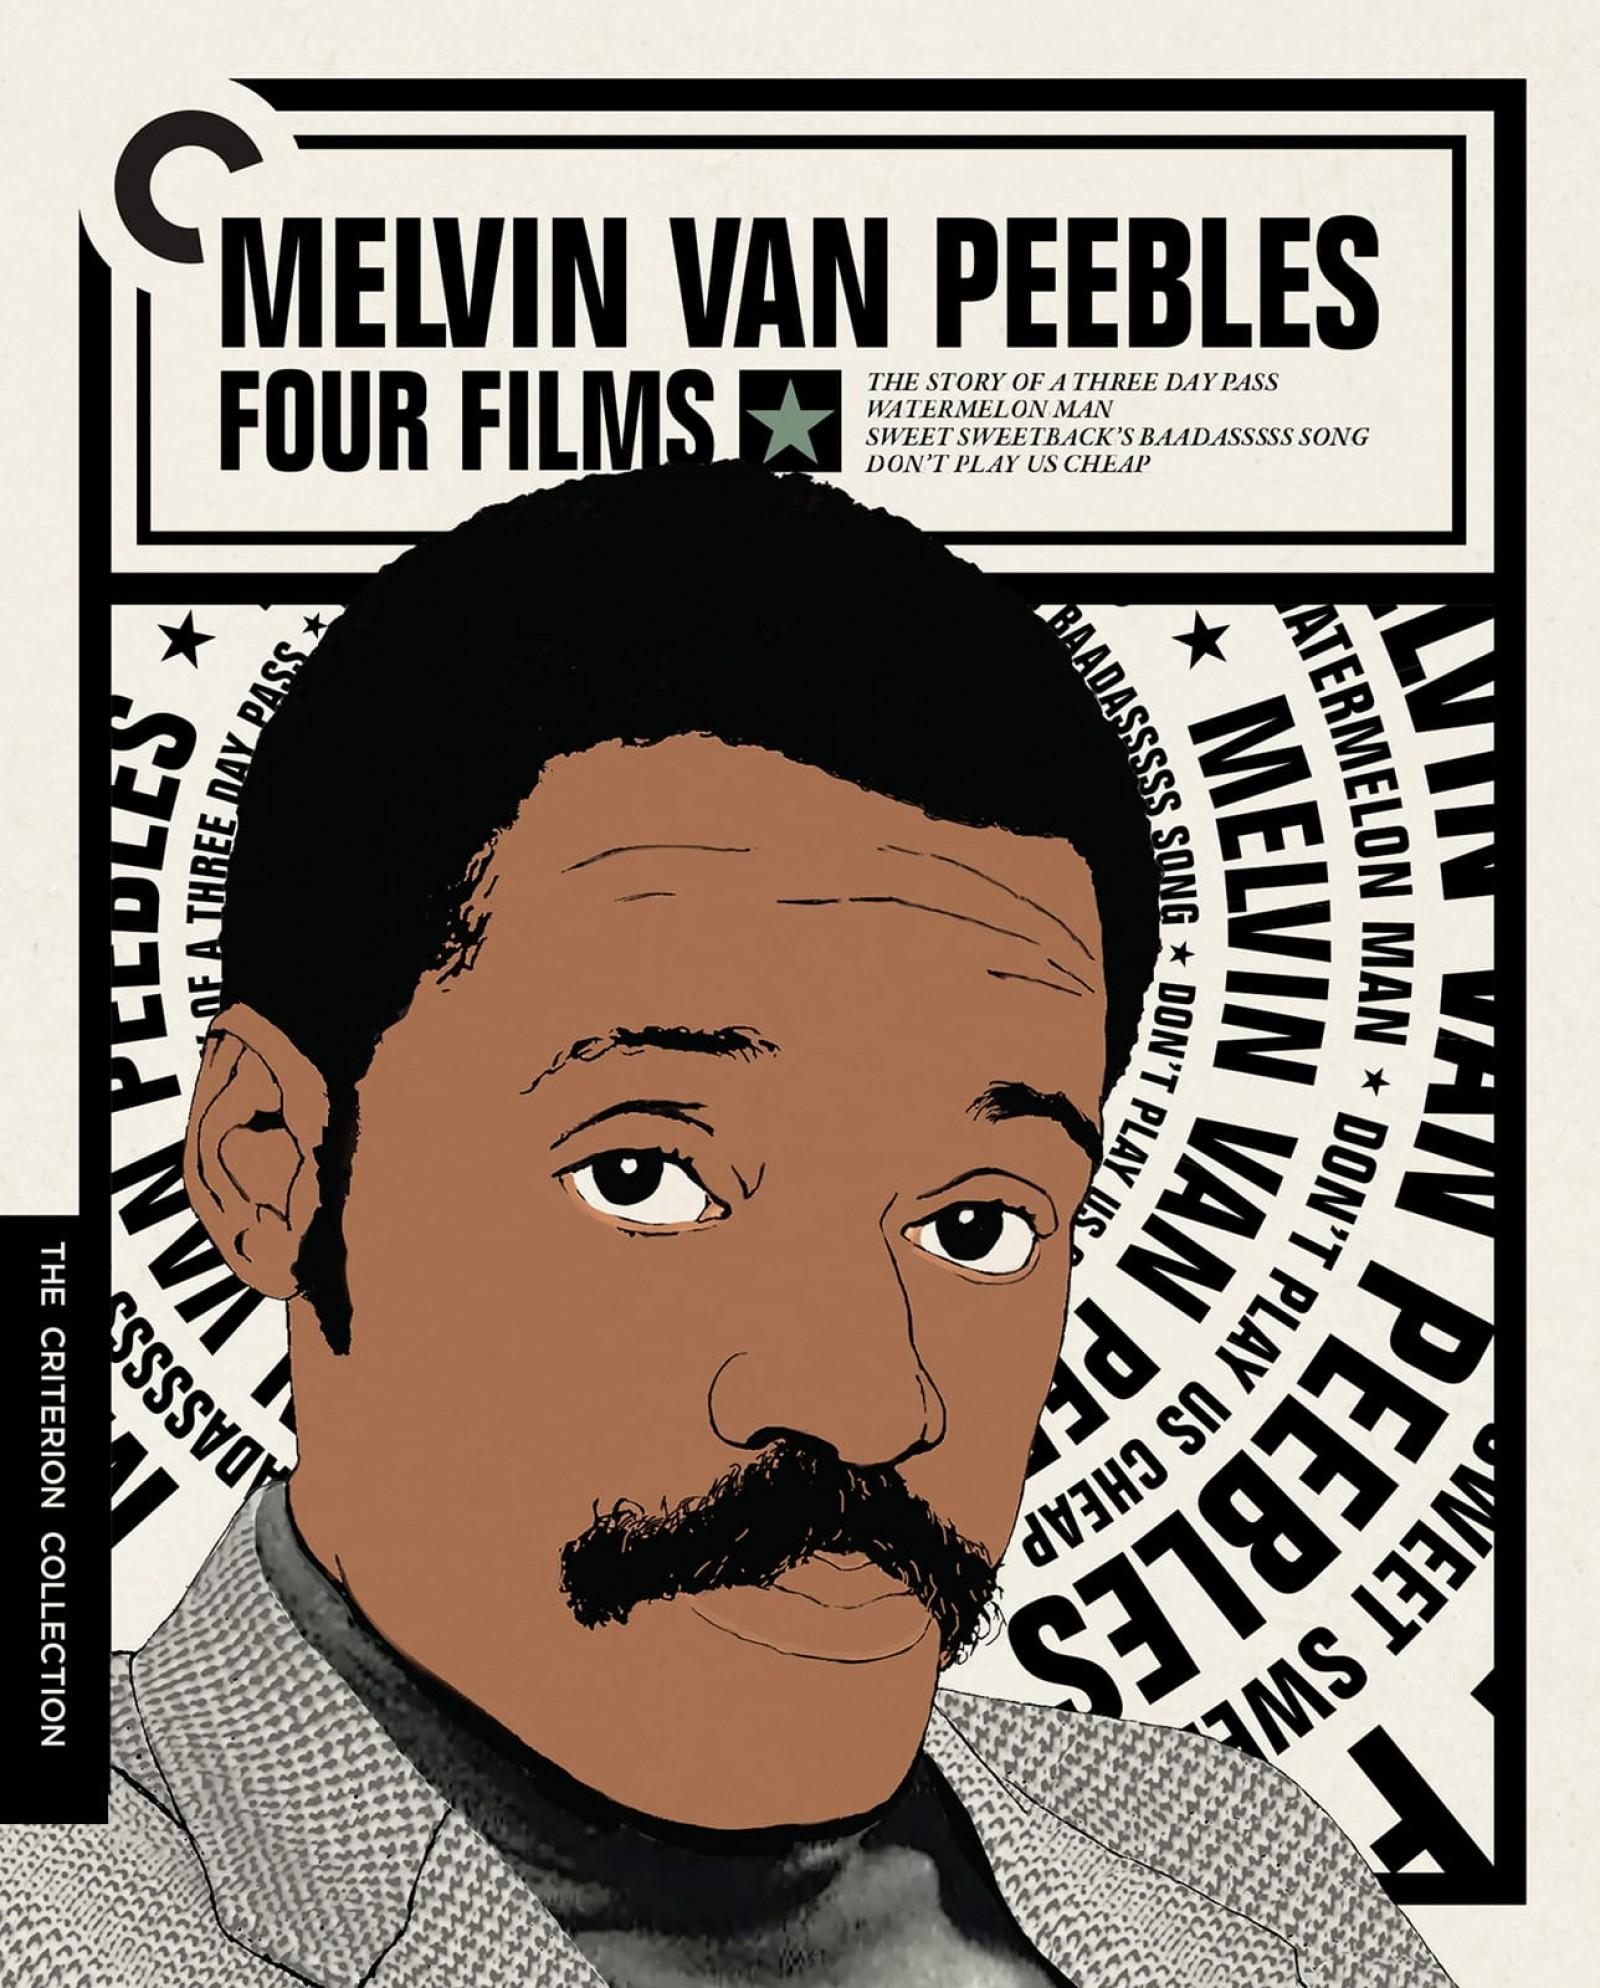 Melvin Van Peebles: Four Films | The Criterion Collection